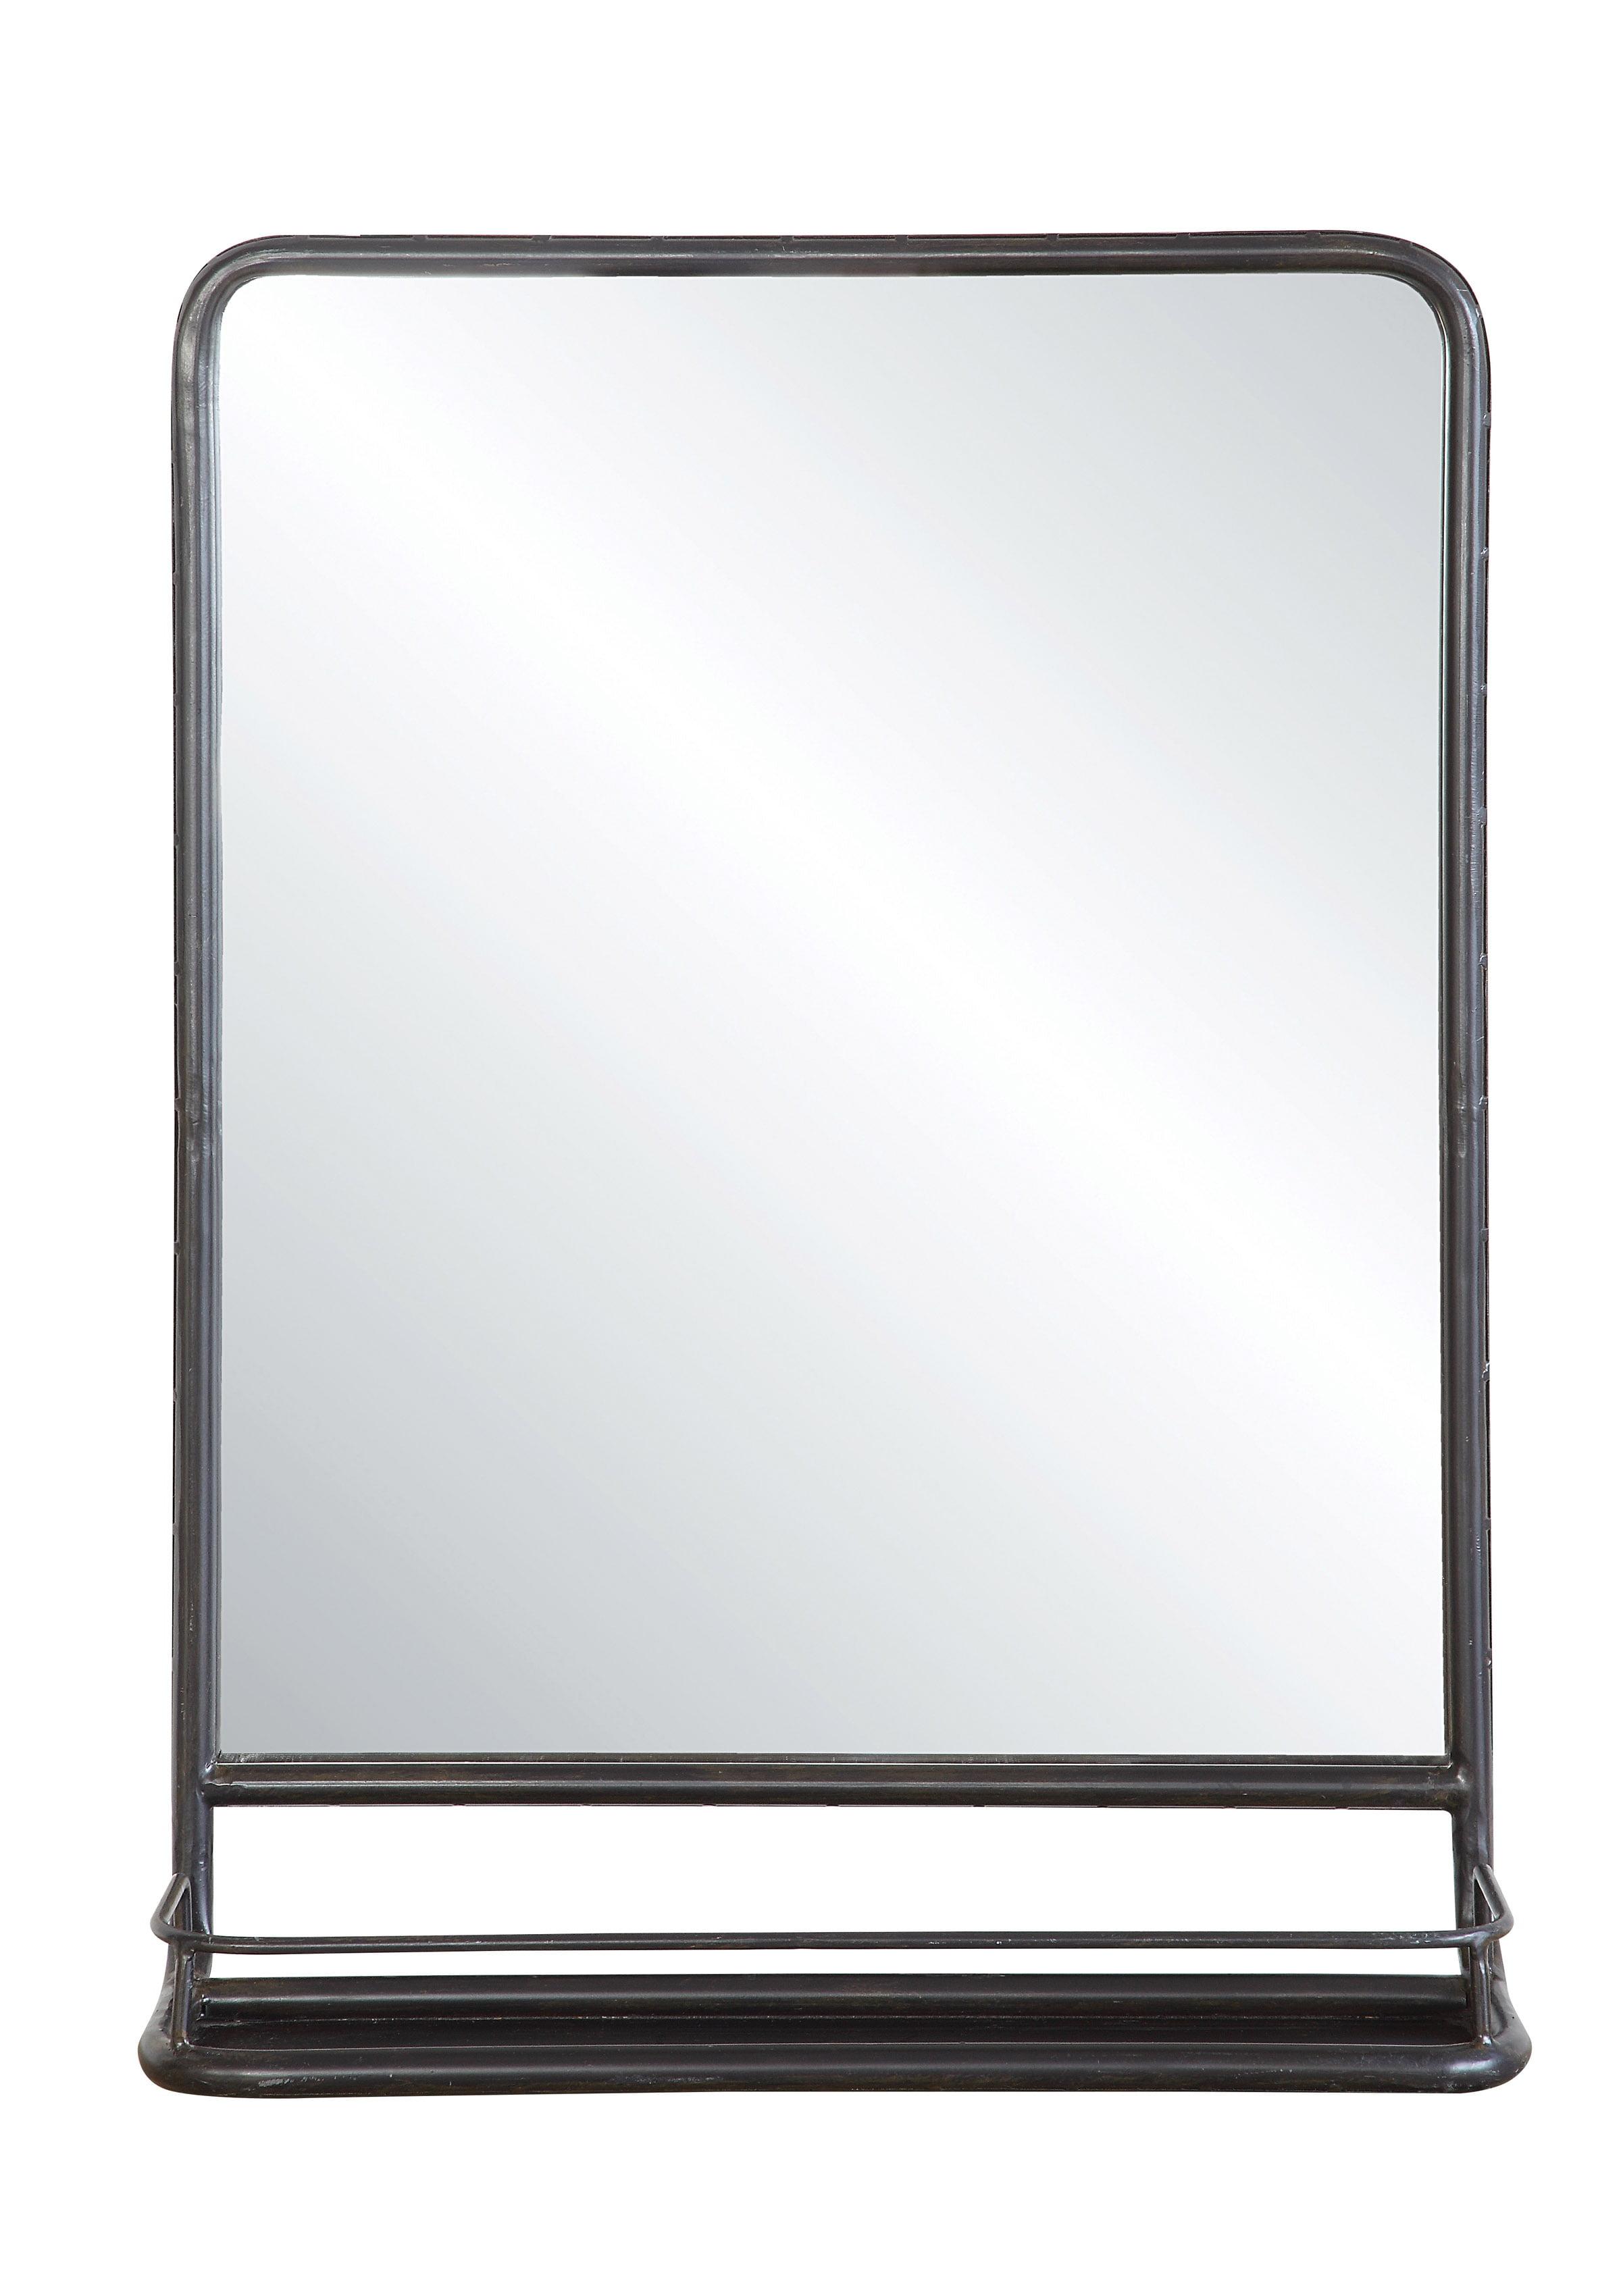 Large Metal Framed Mirror With Shelf Walmart Com Walmart Com